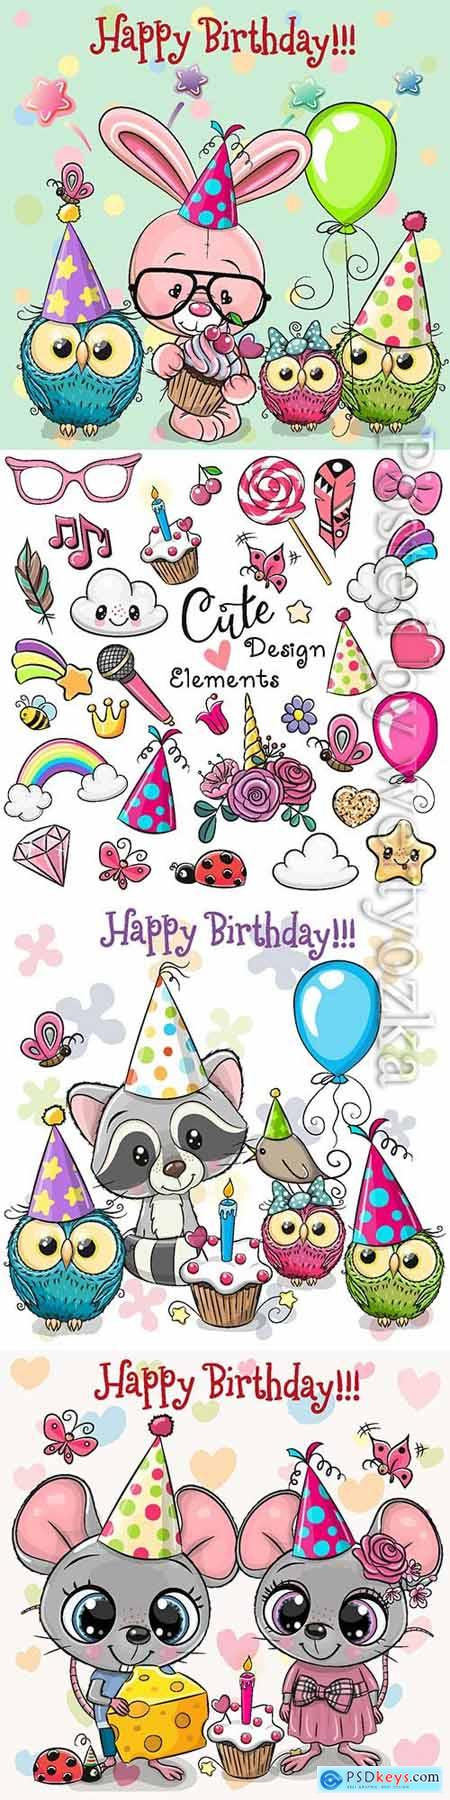 Happy birthday vector, funny animals